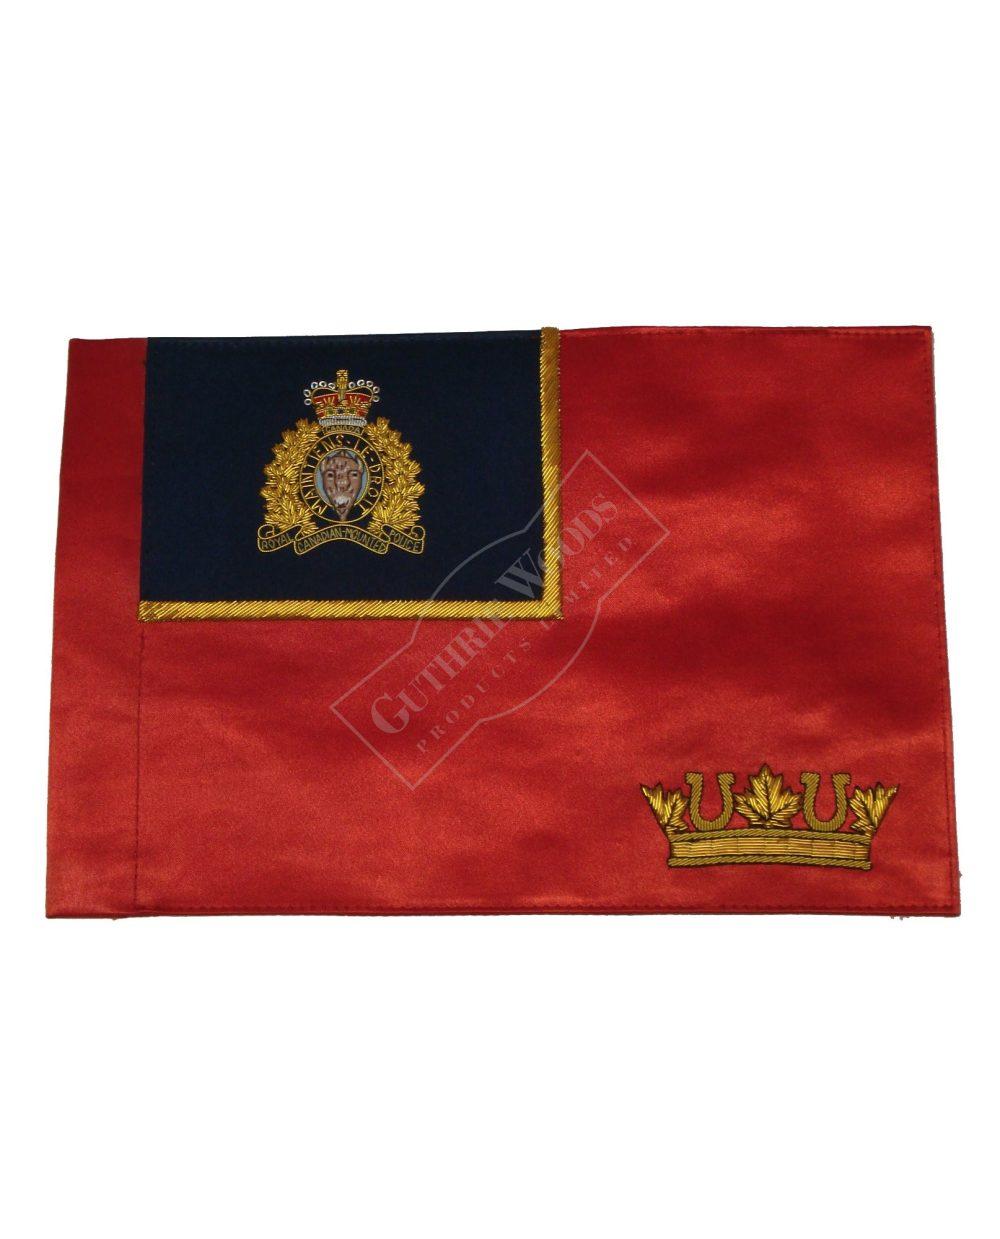 RCMP Miniature Division Ensign R173-HQ